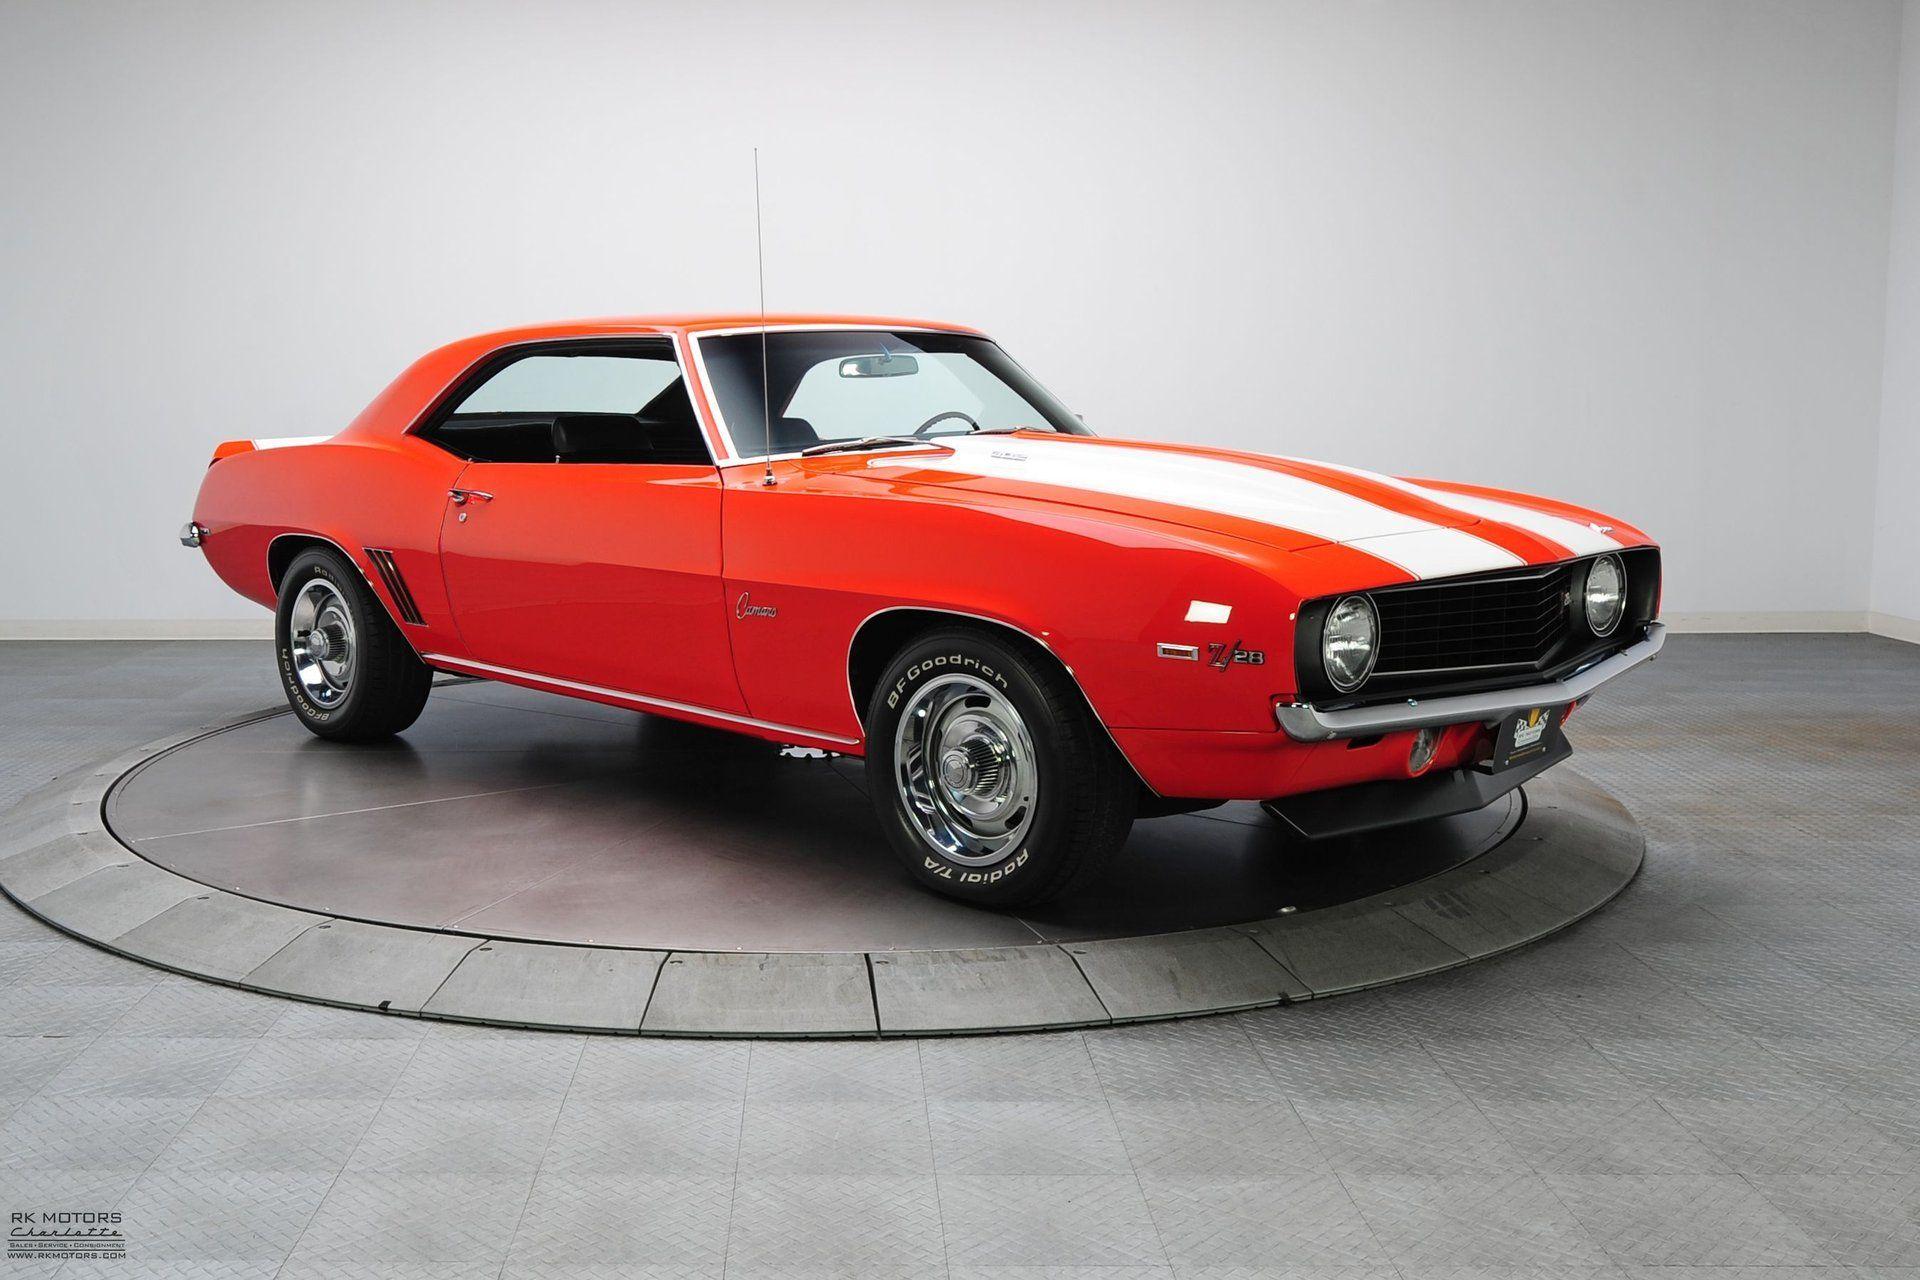 132903 1969 chevrolet camaro rk motors classic cars and